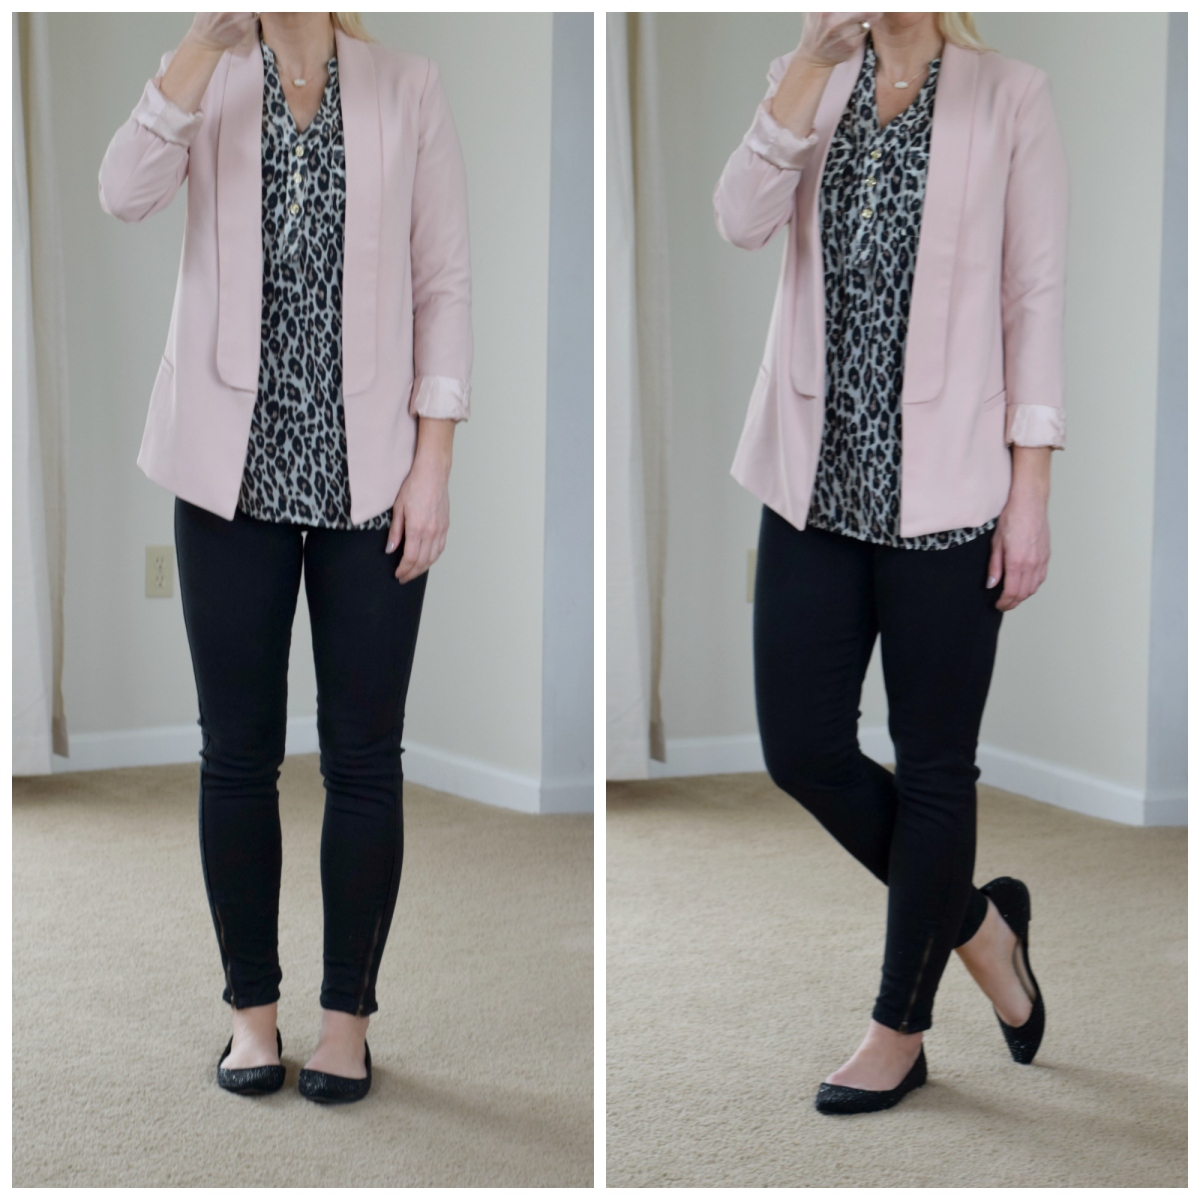 Pink blazer, leopard blouse, and sparkly flats |www.pearlsandsportsbras.com|